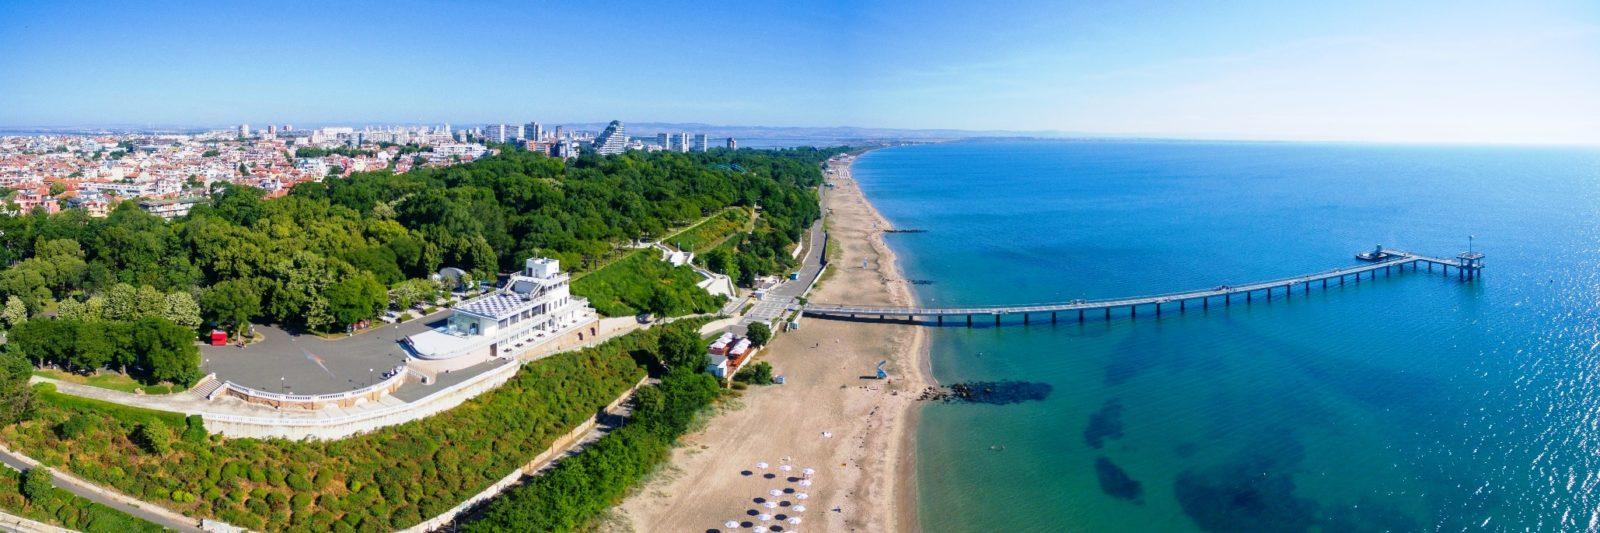 Курорт Бургас море